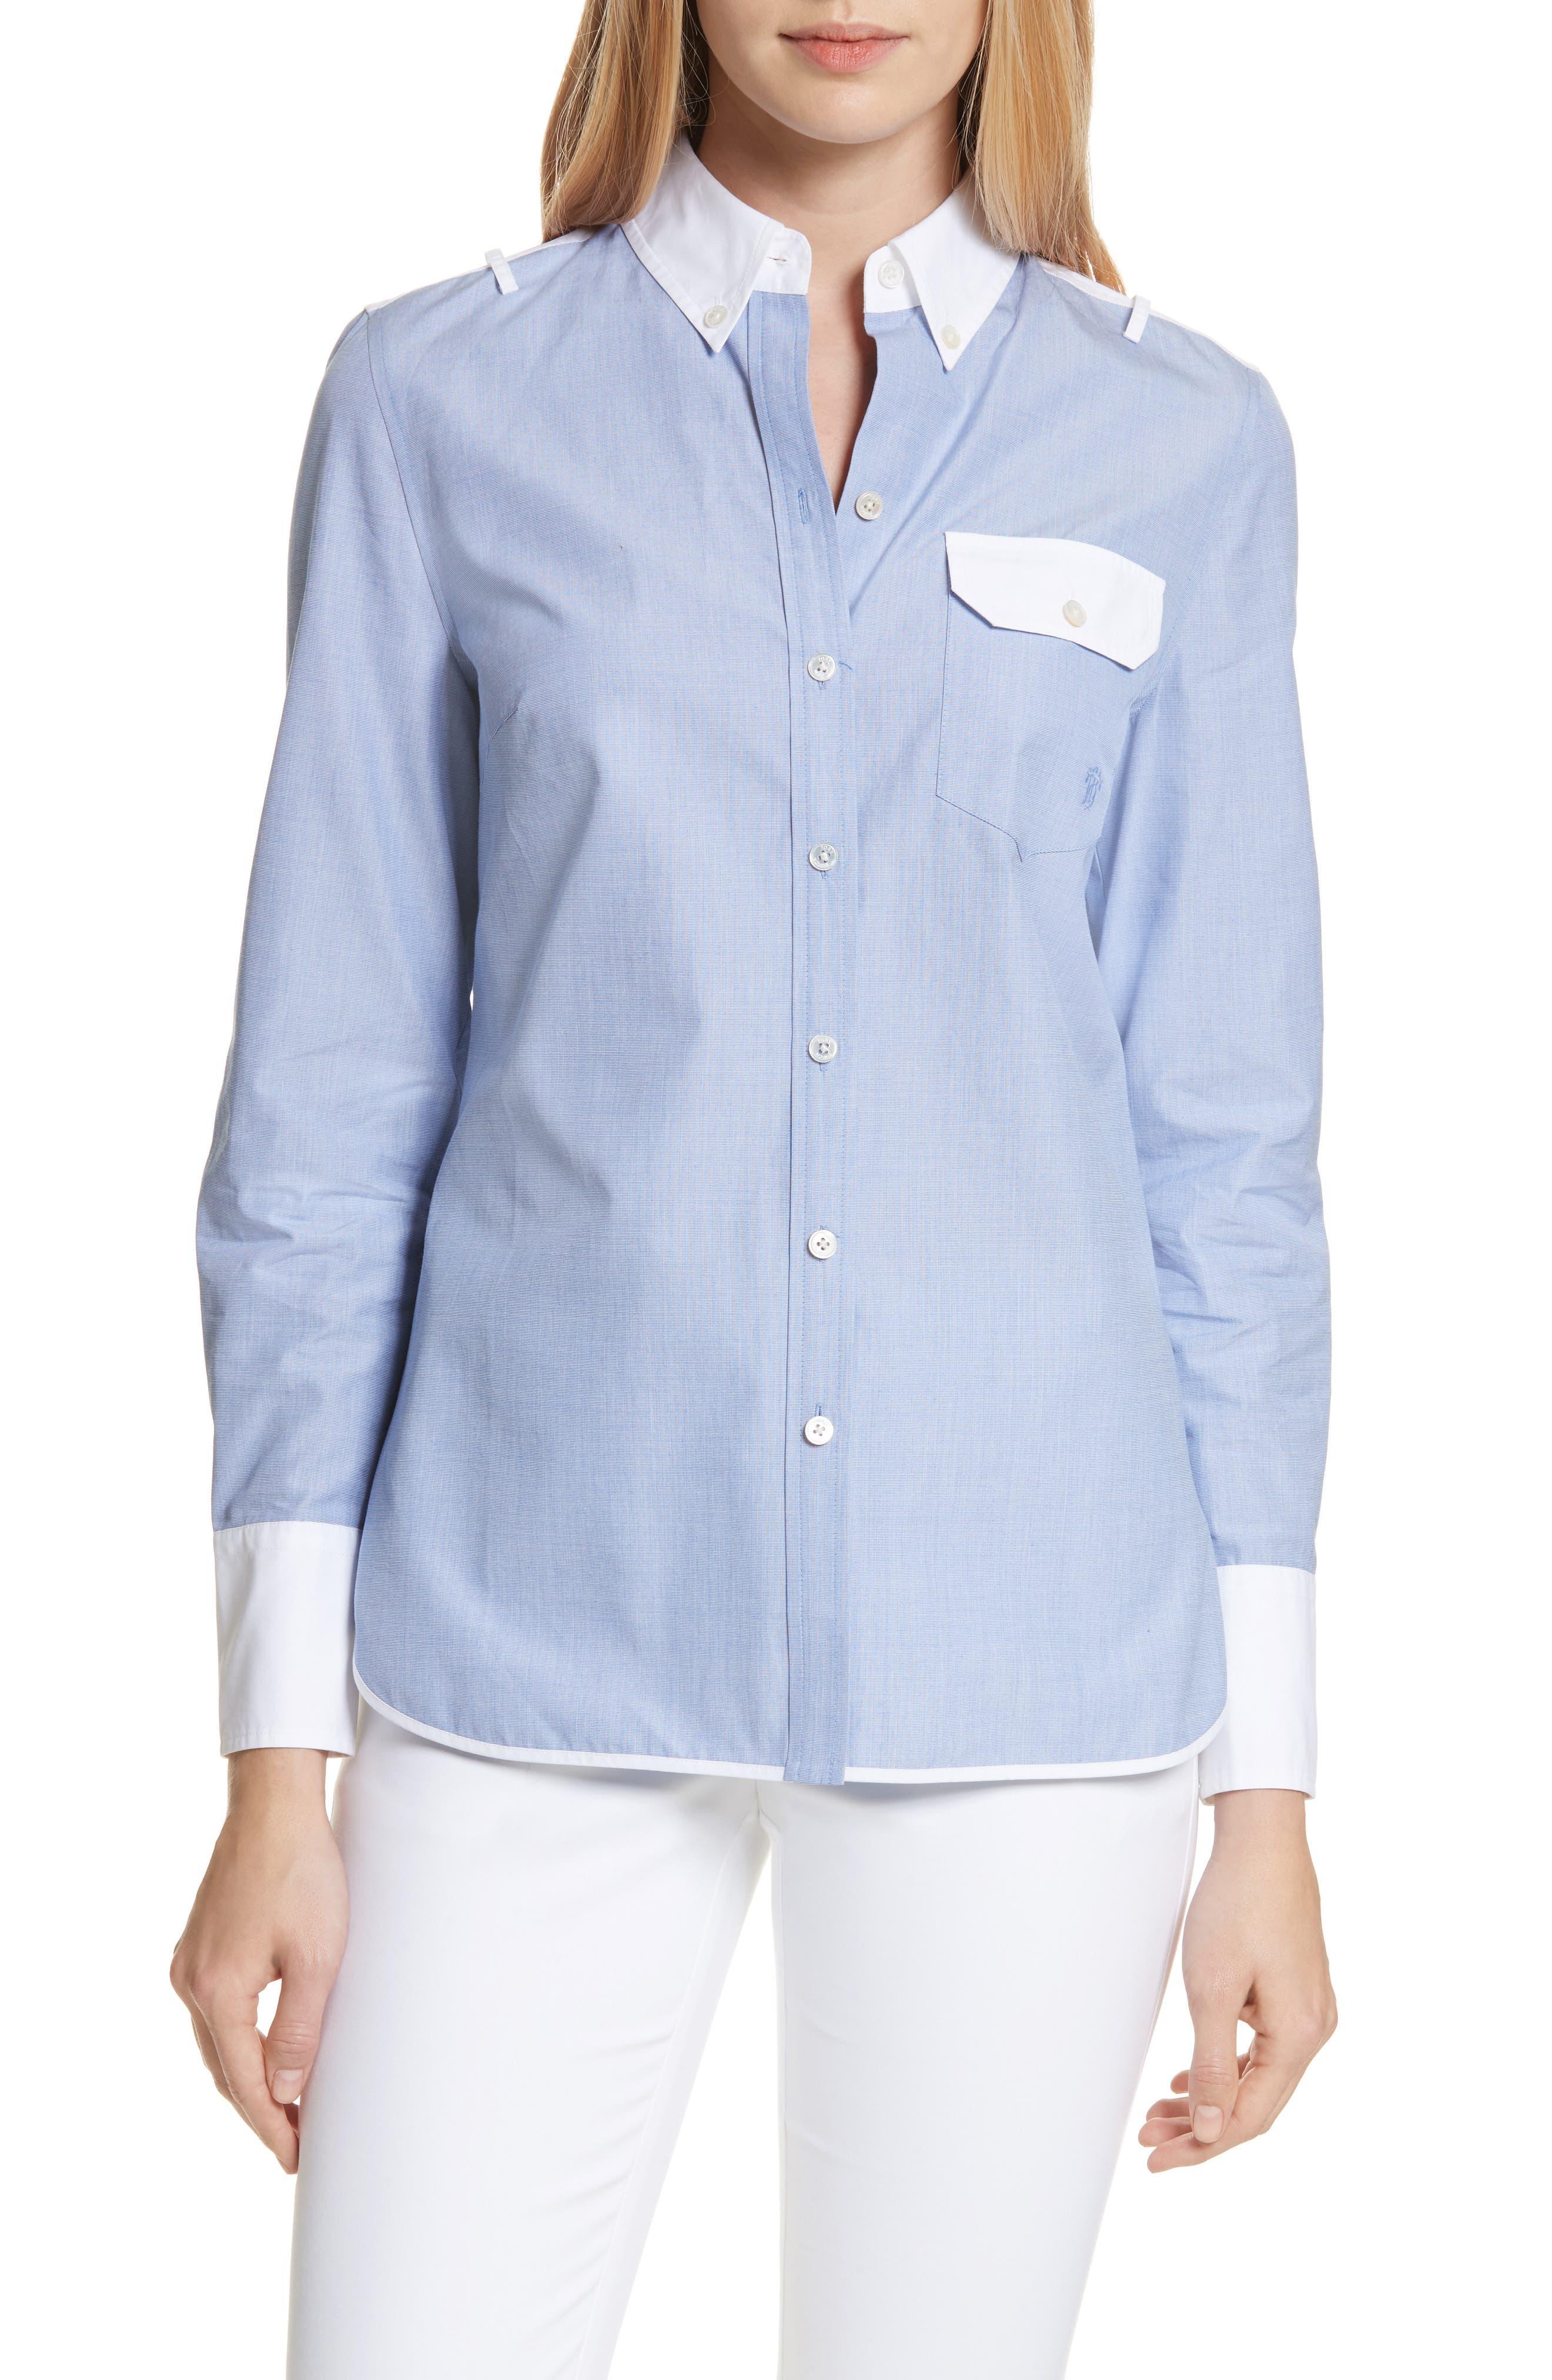 Piper Contrast Cotton Top,                         Main,                         color, 422